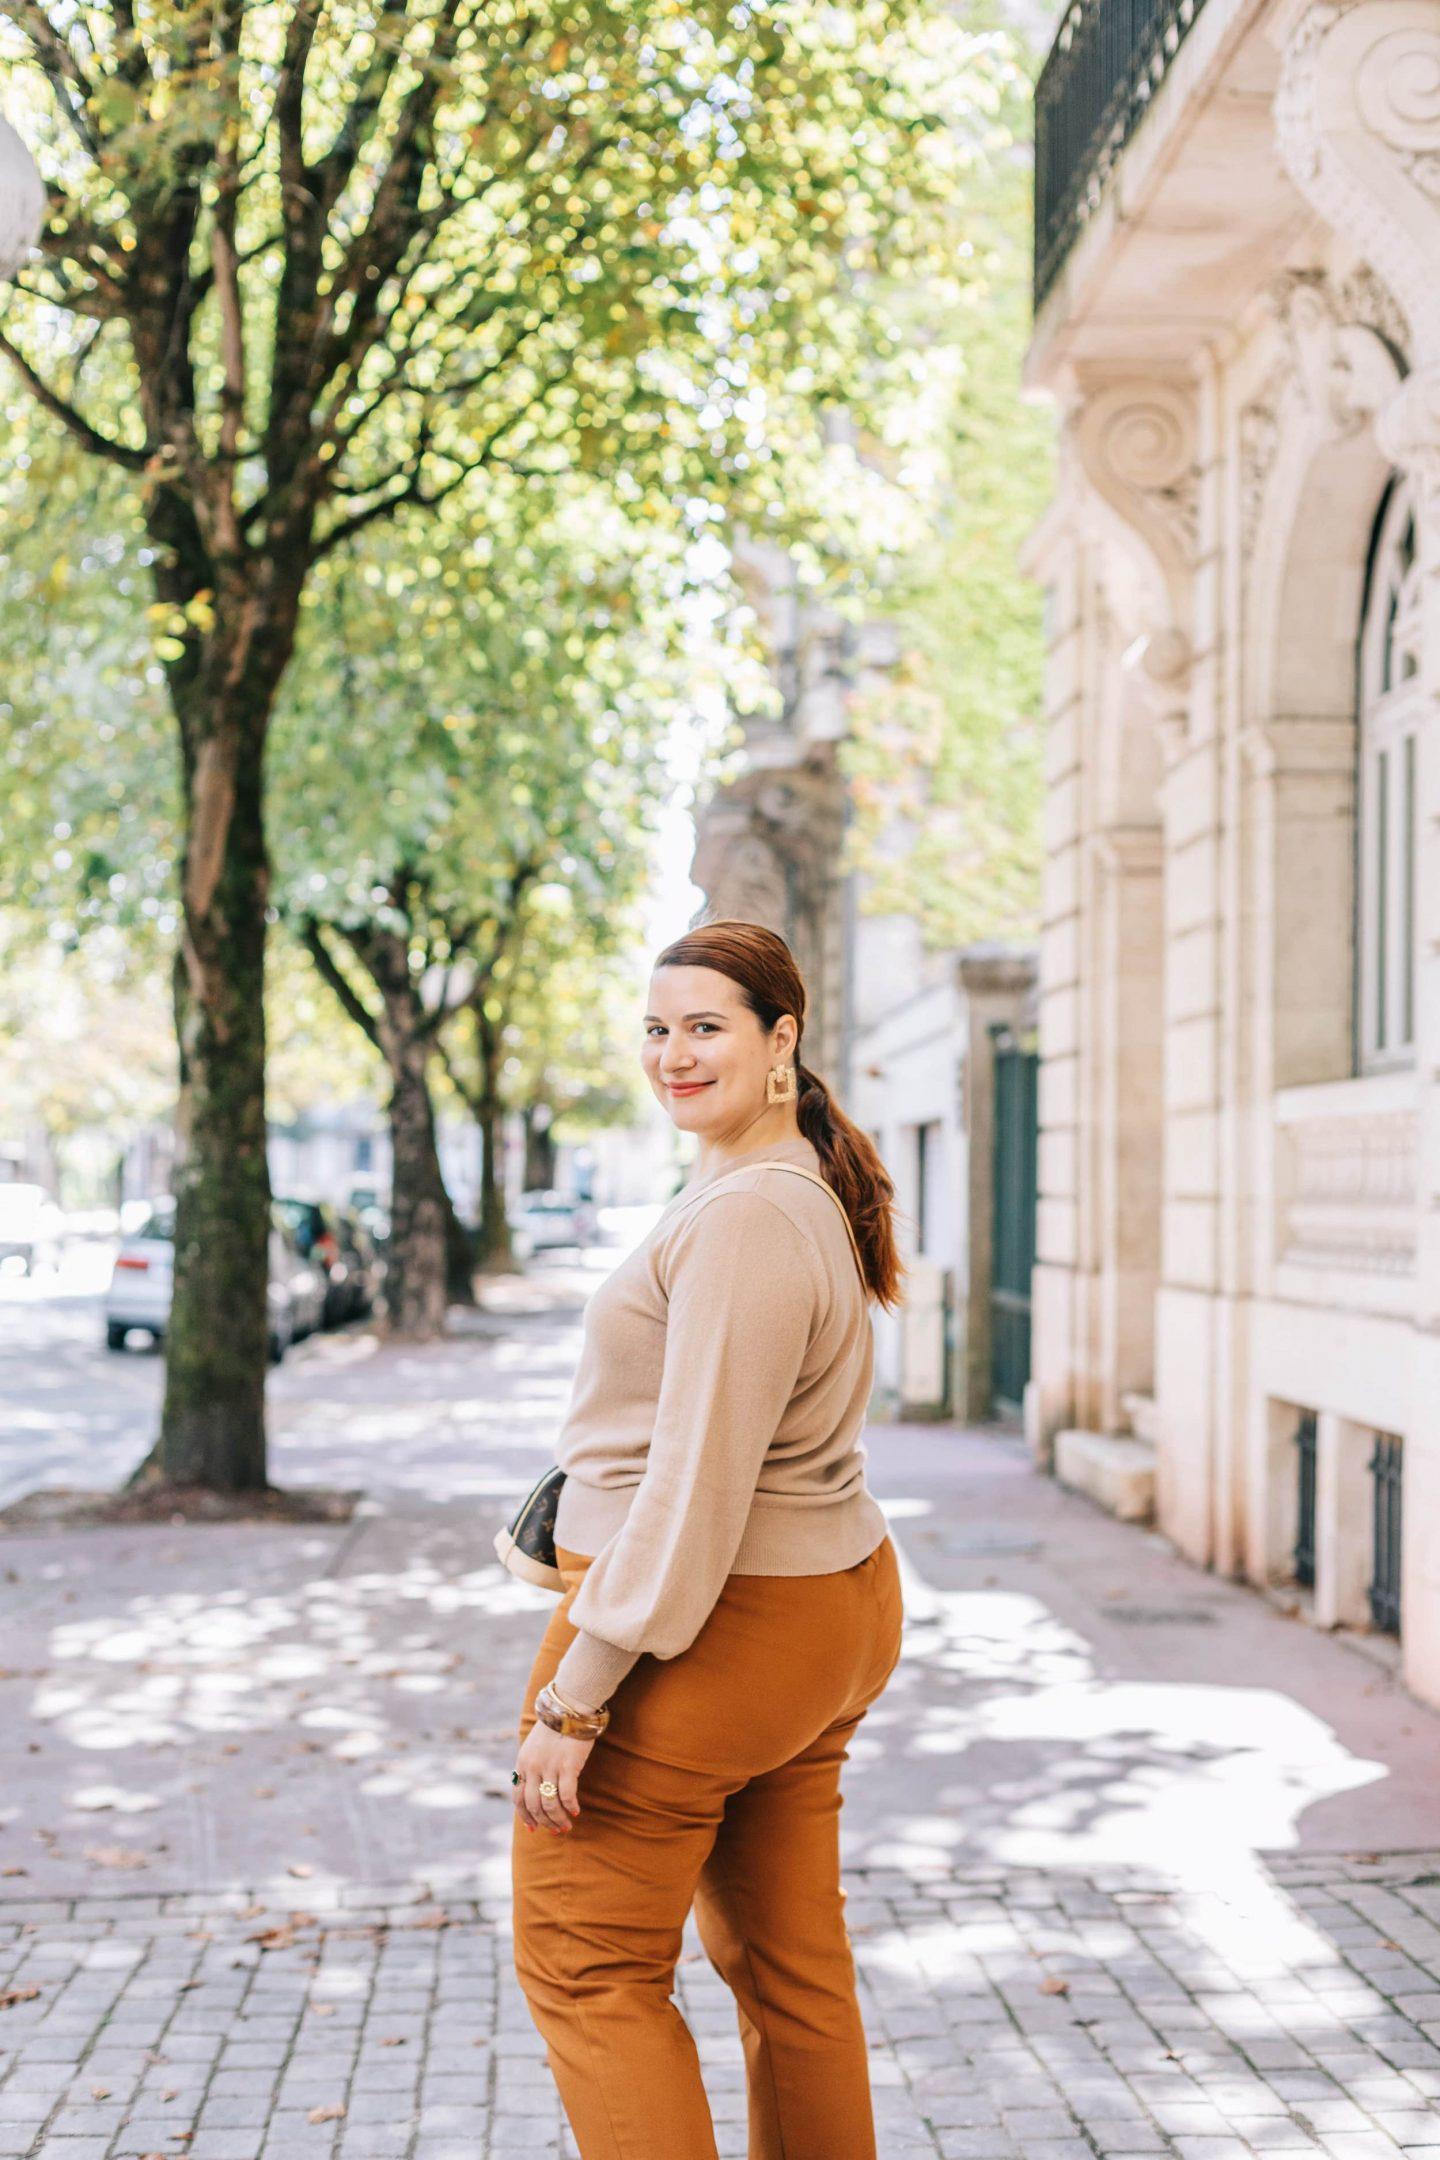 alexandra-influenceuse-body-positive-coco-frio